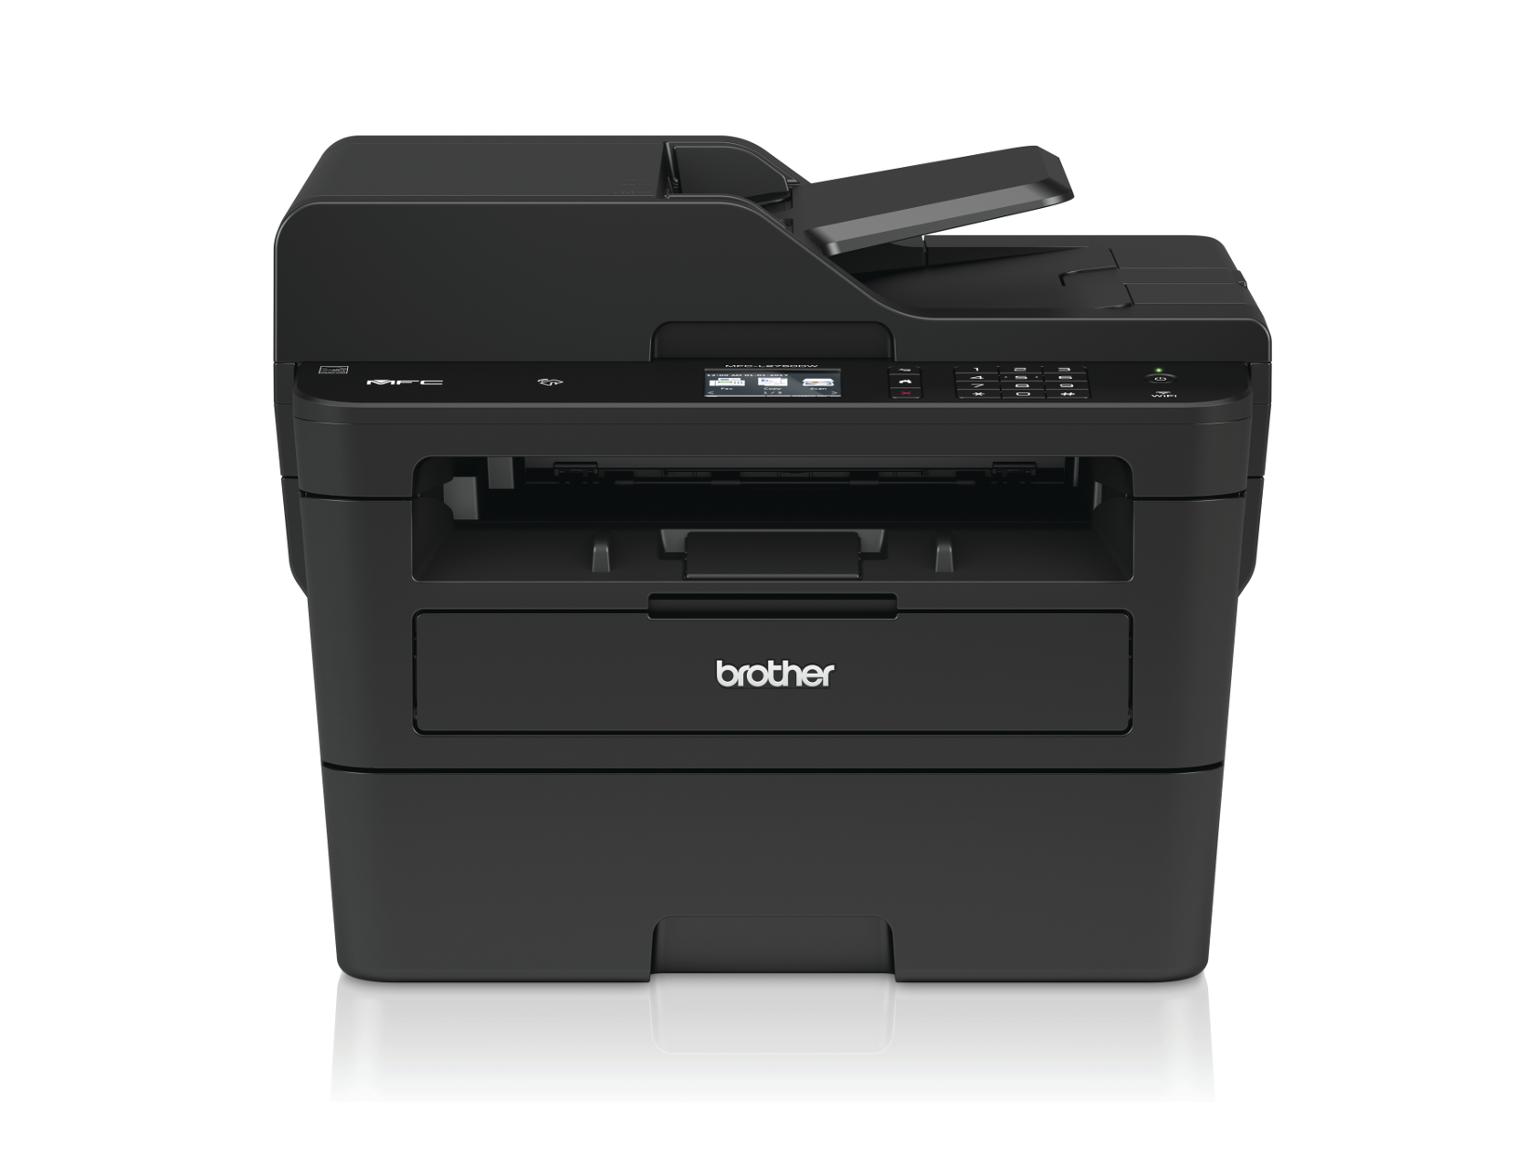 Impressora multifunções laser monocromática MFC-L2750DW